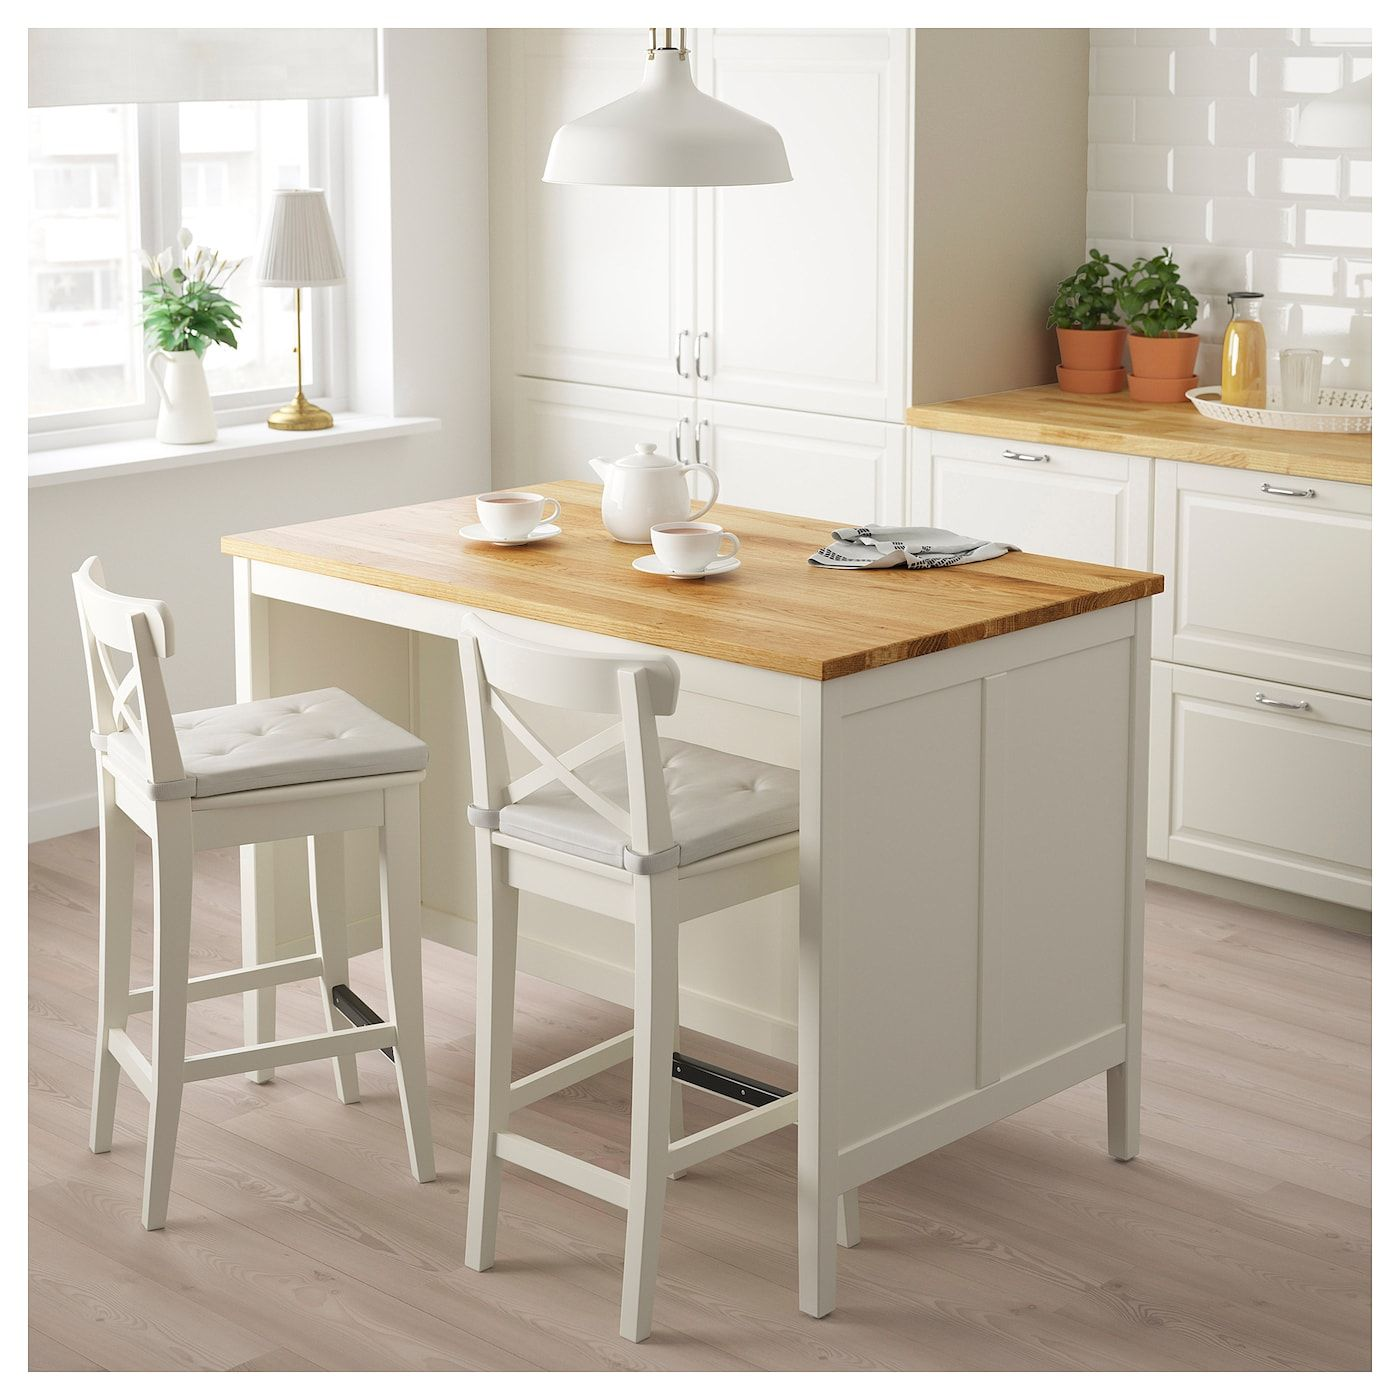 Altezza Cucina Ikea isola per cucina ikea